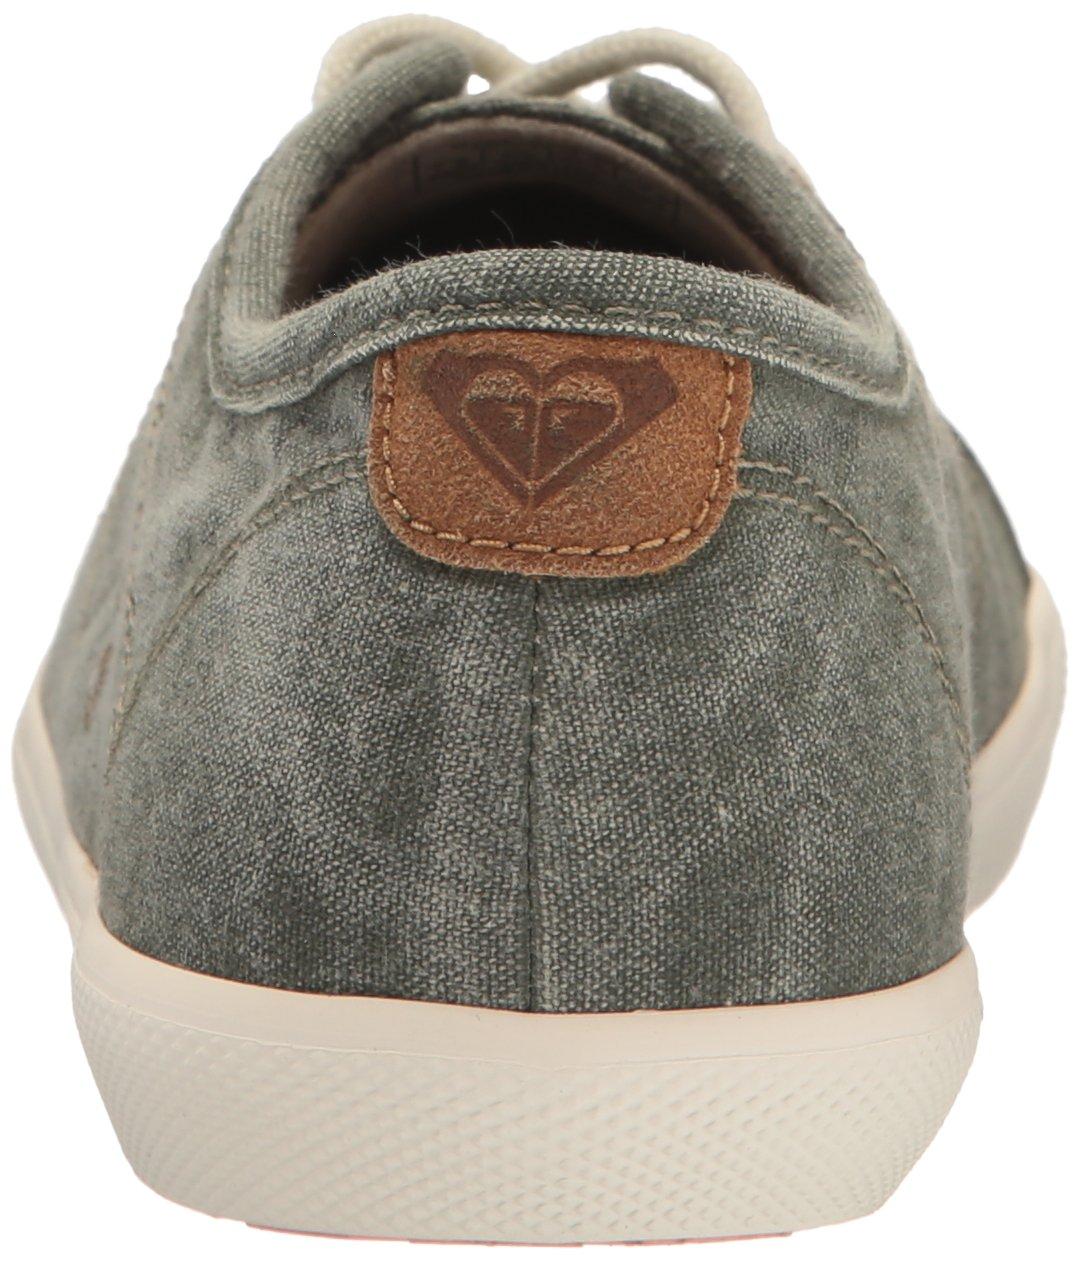 Roxy Women's Memphis Lace up Shoe Fashion Sneaker B01GOLL4EO 7 B(M) US|Olive